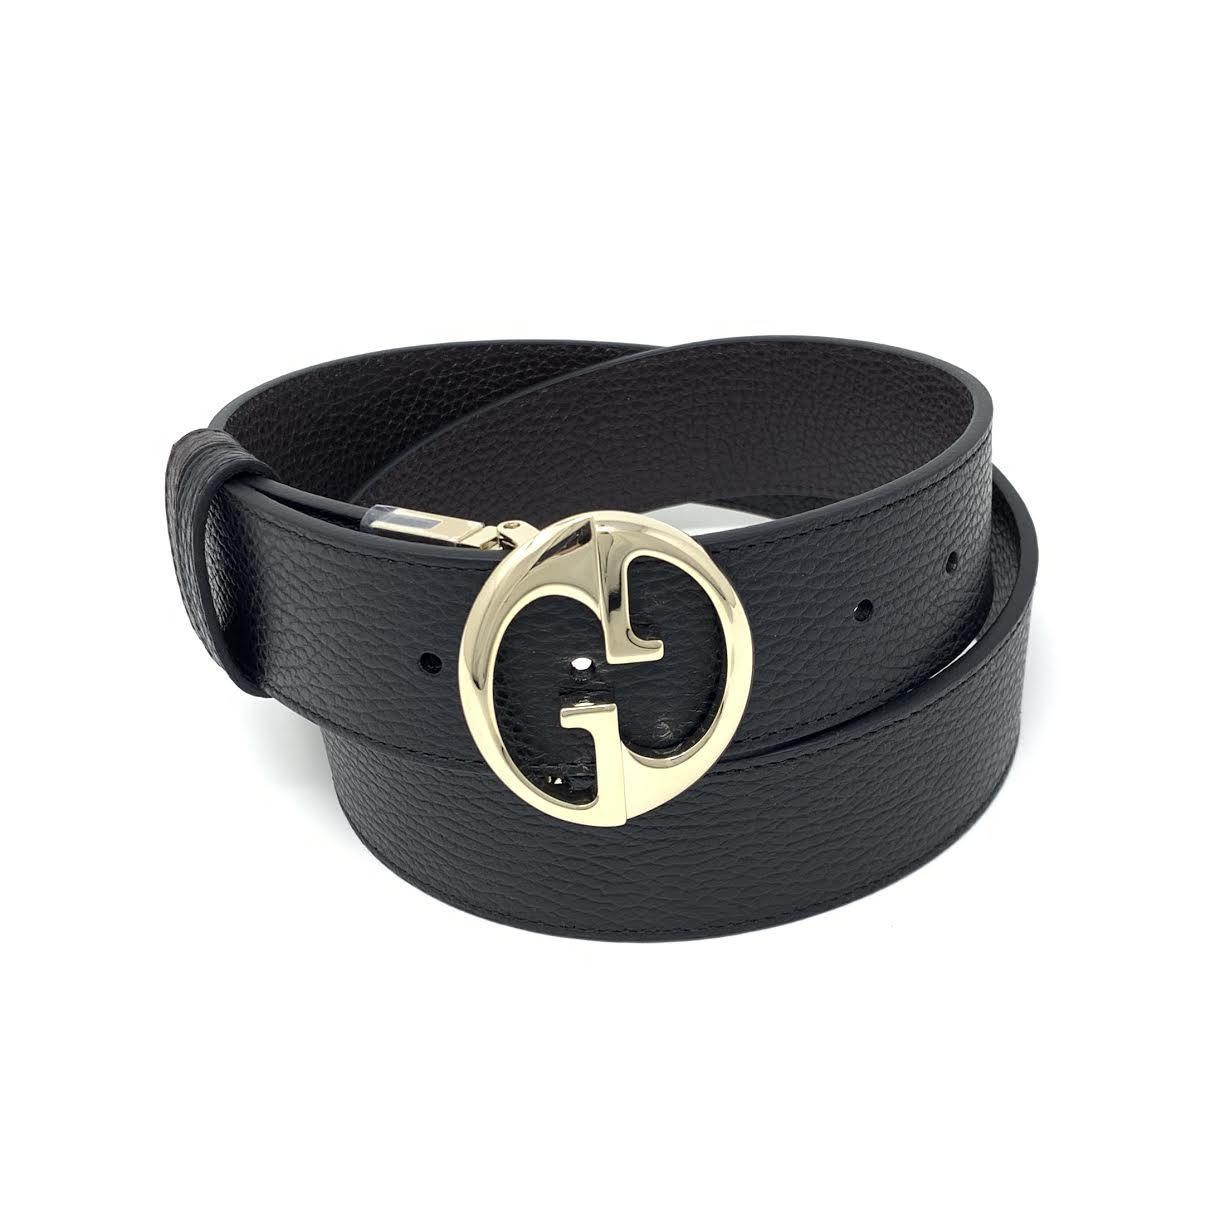 Gucci Interlocking G Reversible Belt 1.5W Black/Brown